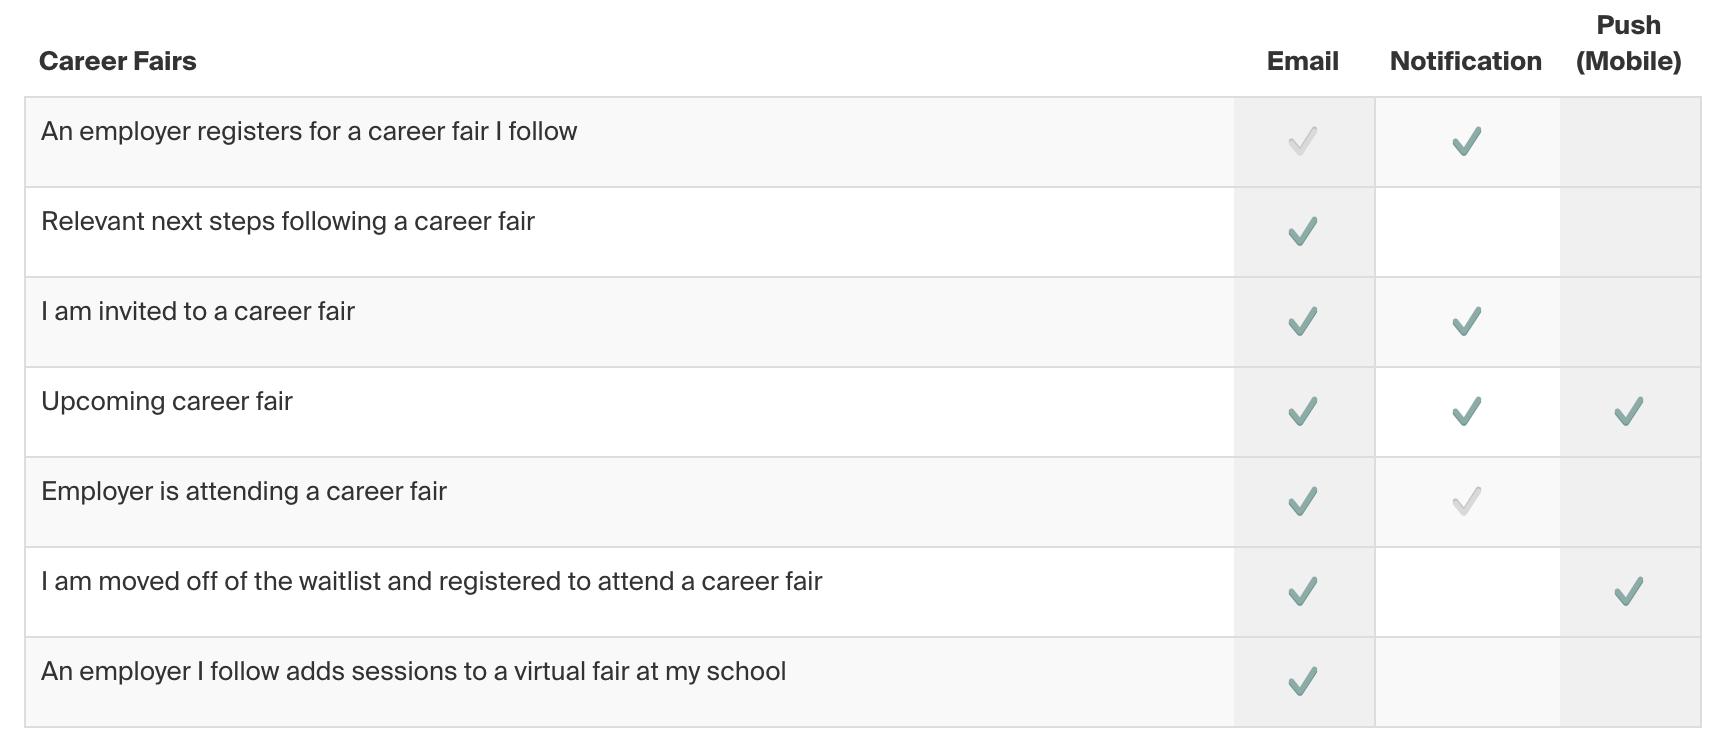 career_fairs_notifications.png